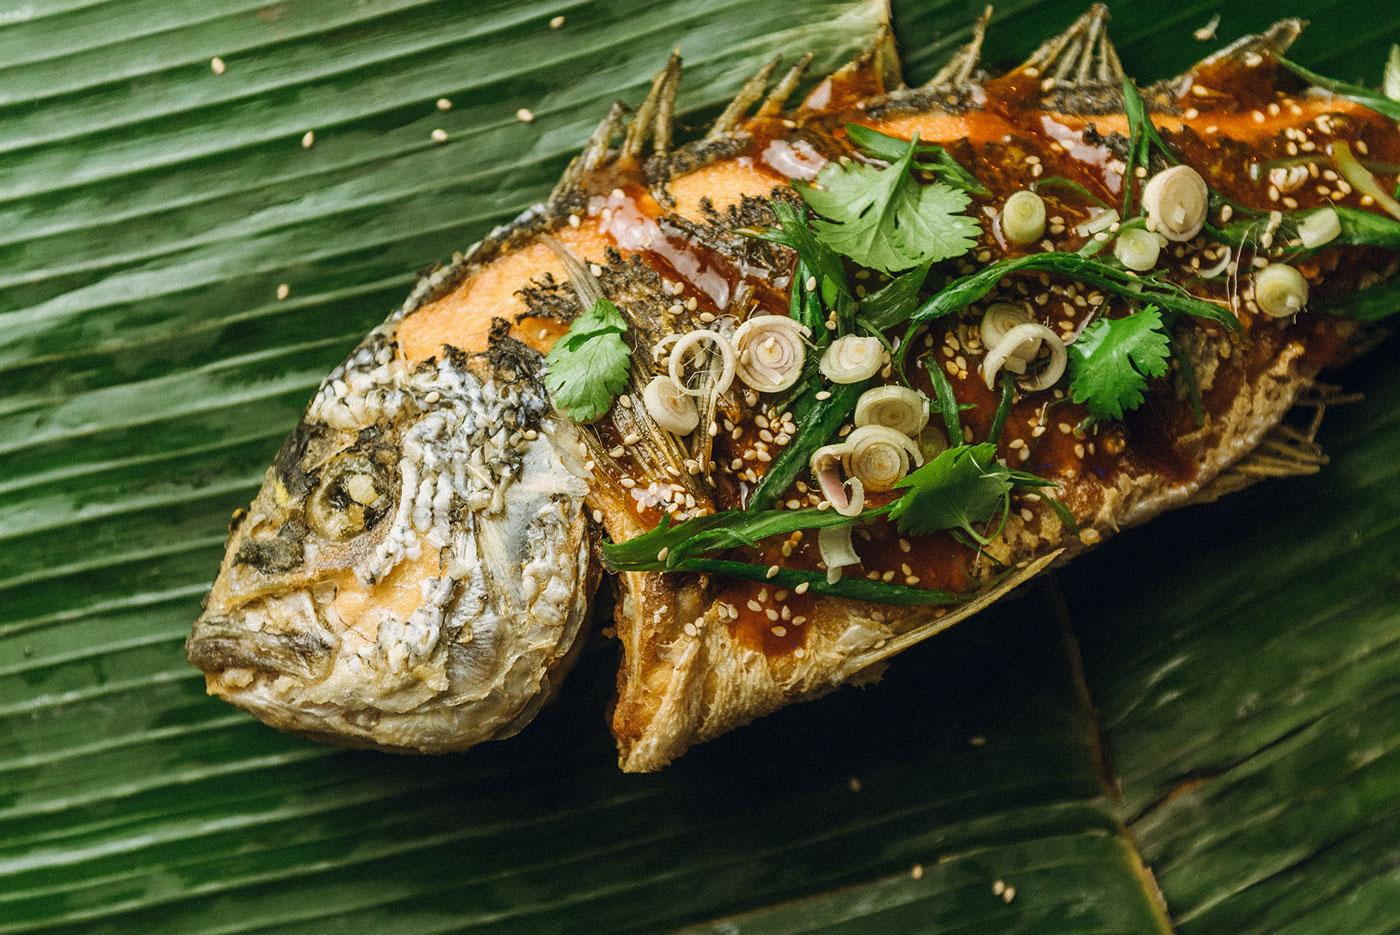 fish-fried-weekend-special-tuk-tuk